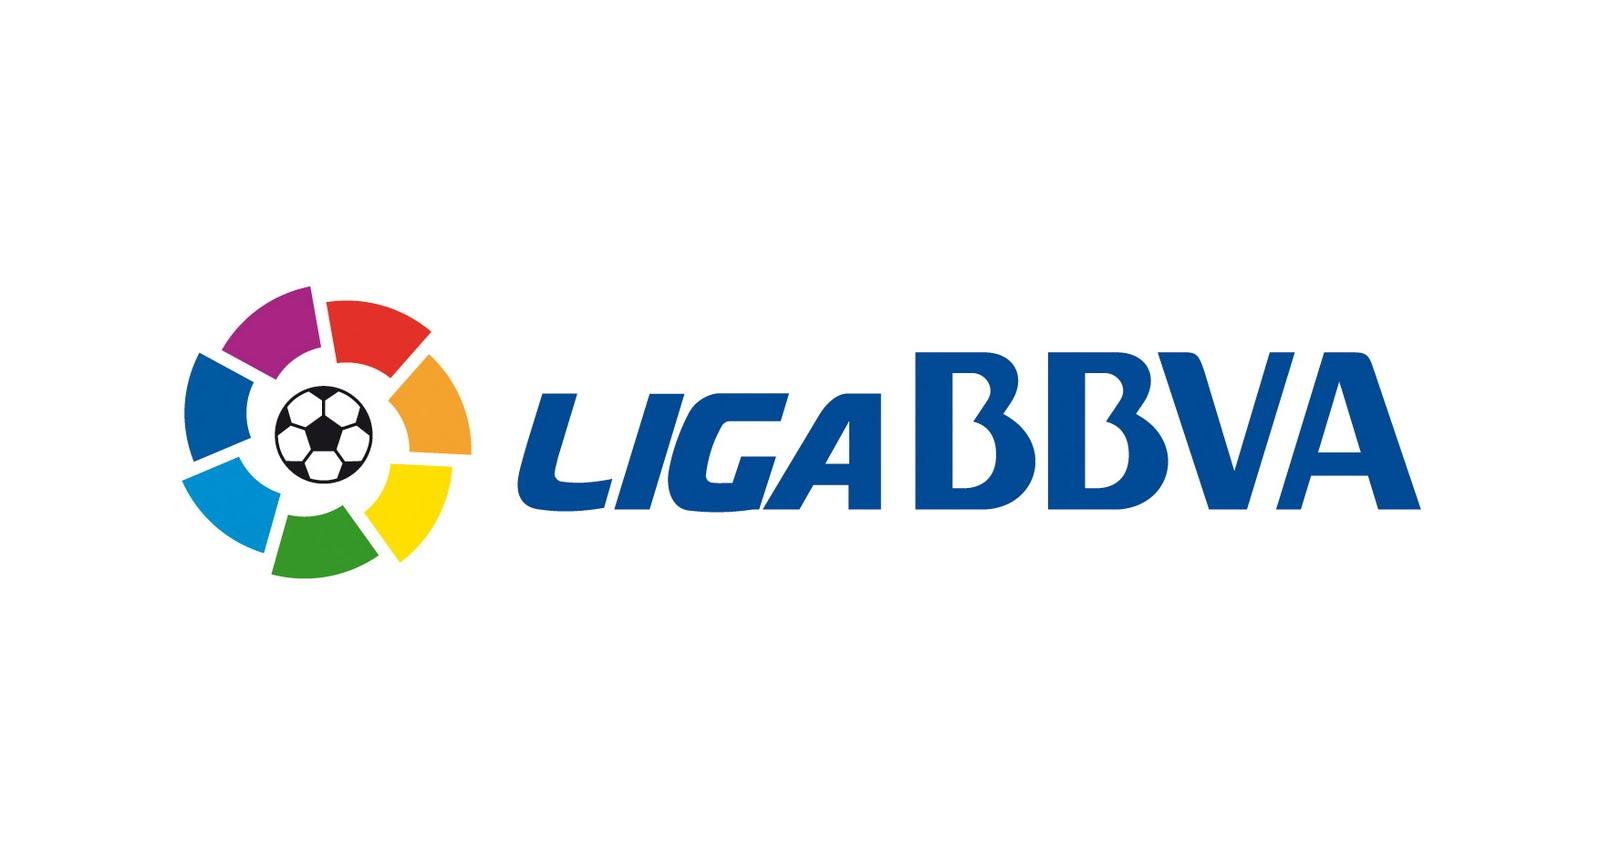 Calendario Liga BBVA 2014/15